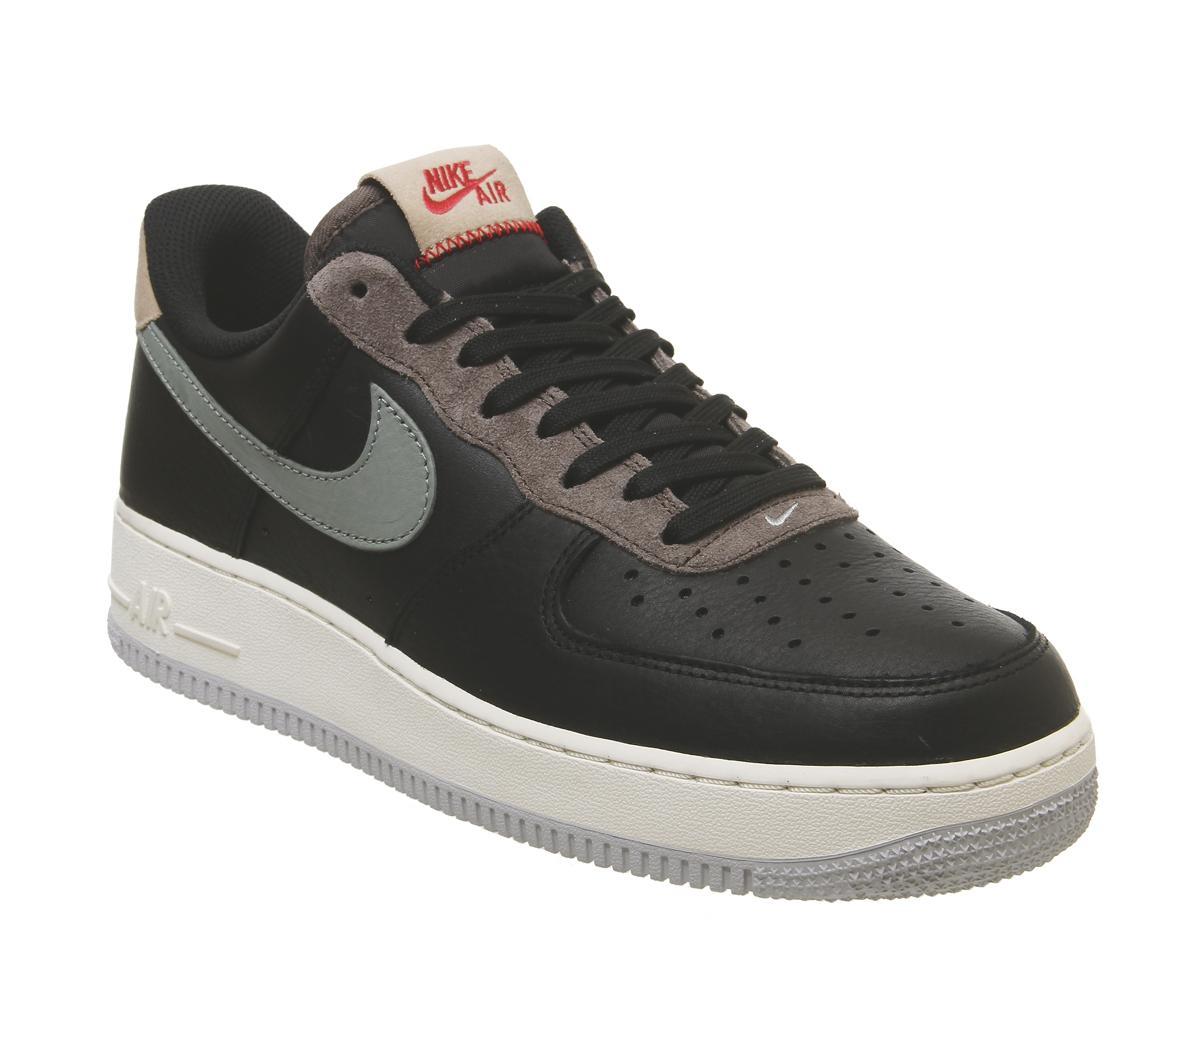 Nike Air Force 1 07 Trainers Black Mica